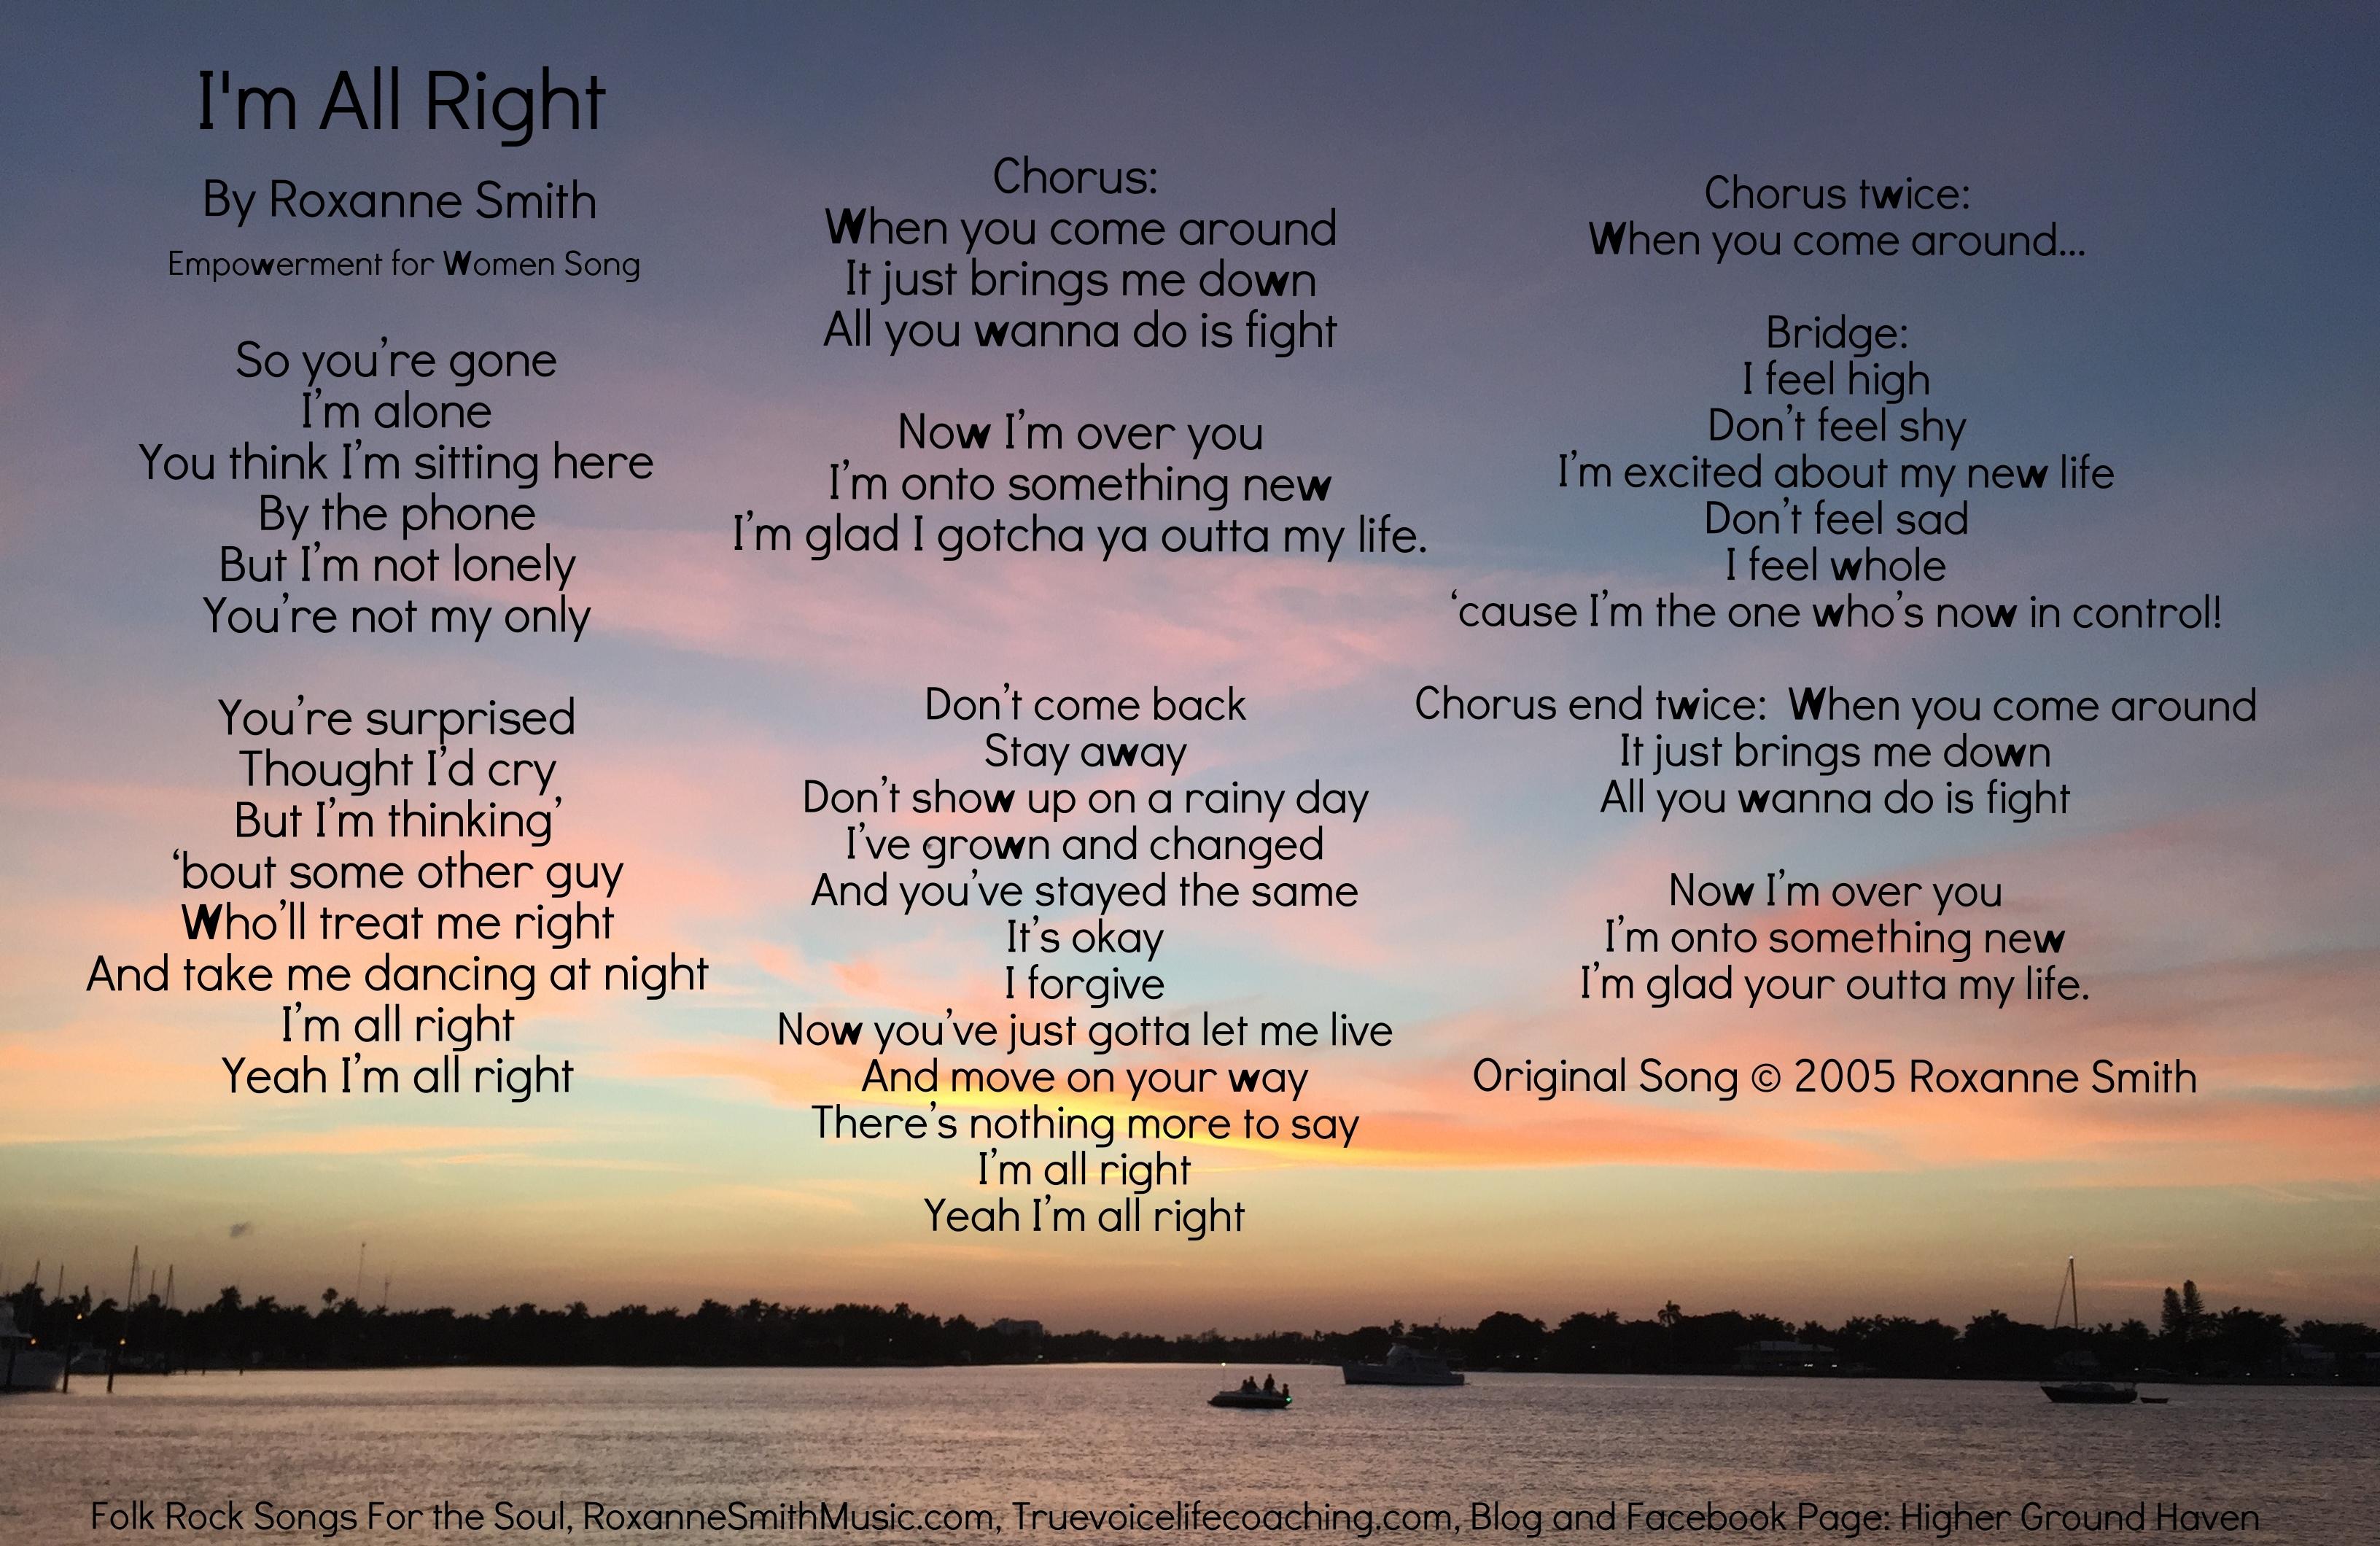 Lyric Photo--I'm All Right